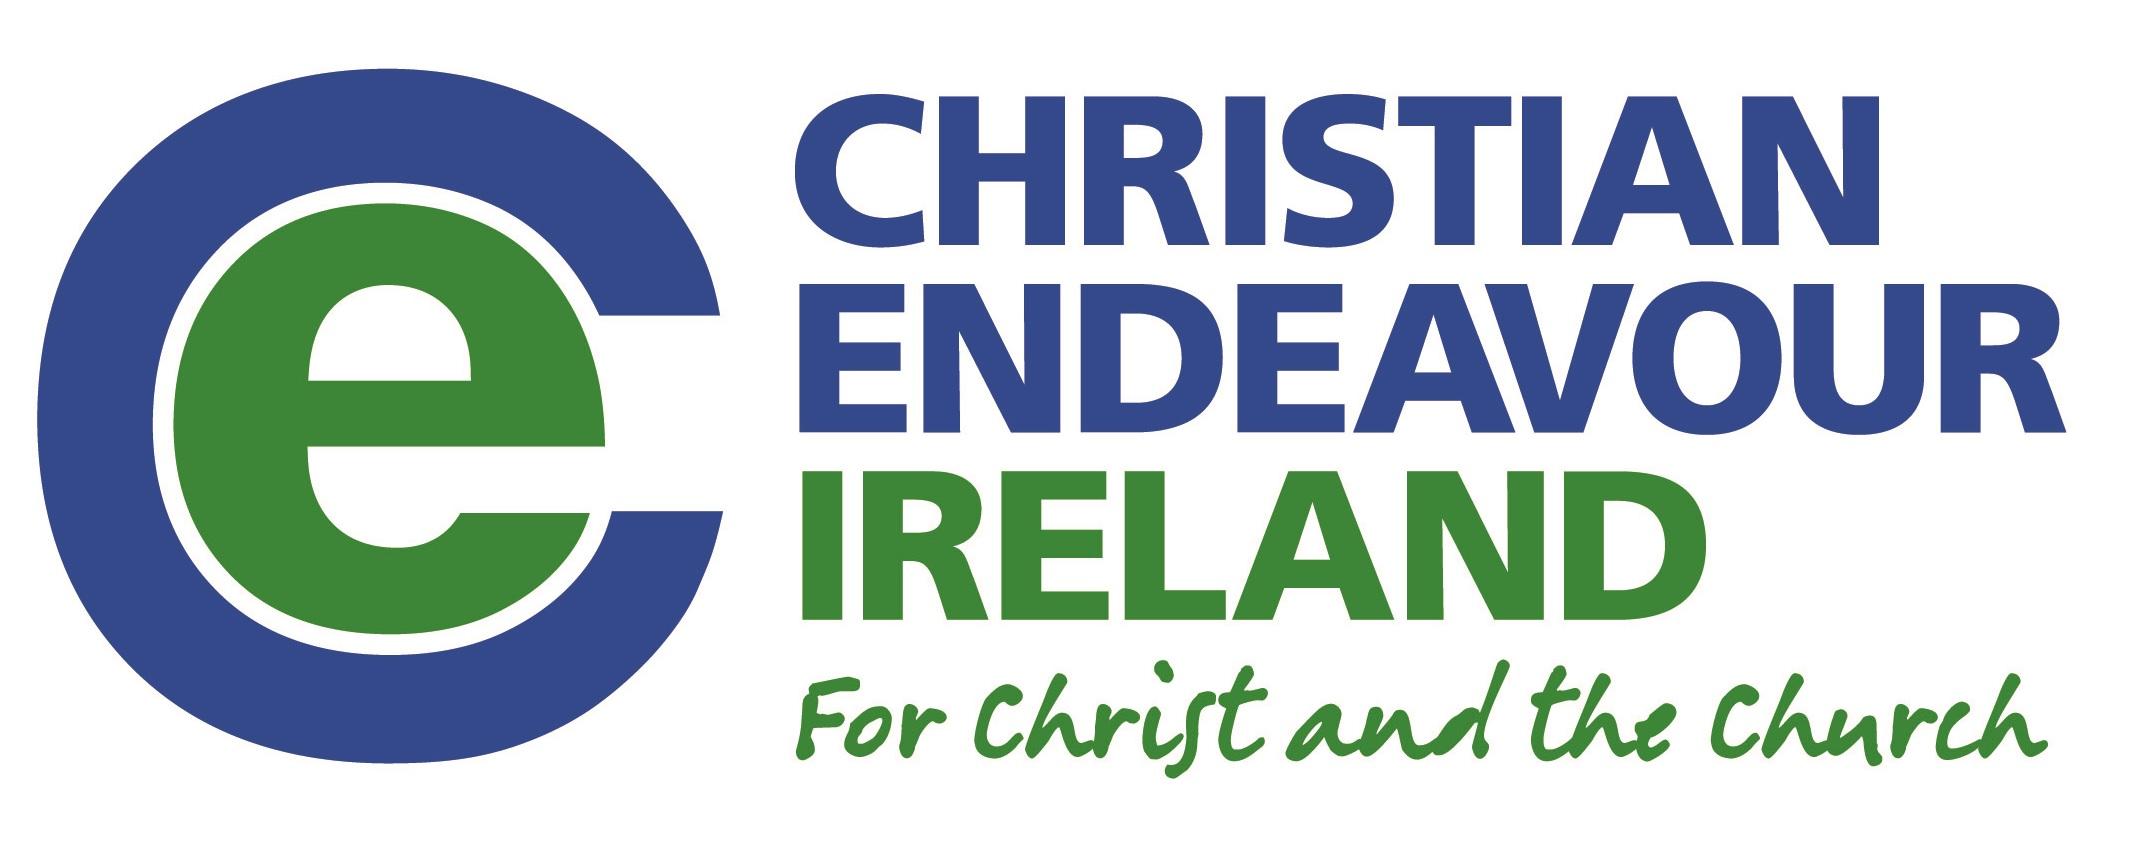 Image result for christian endeavor ireland